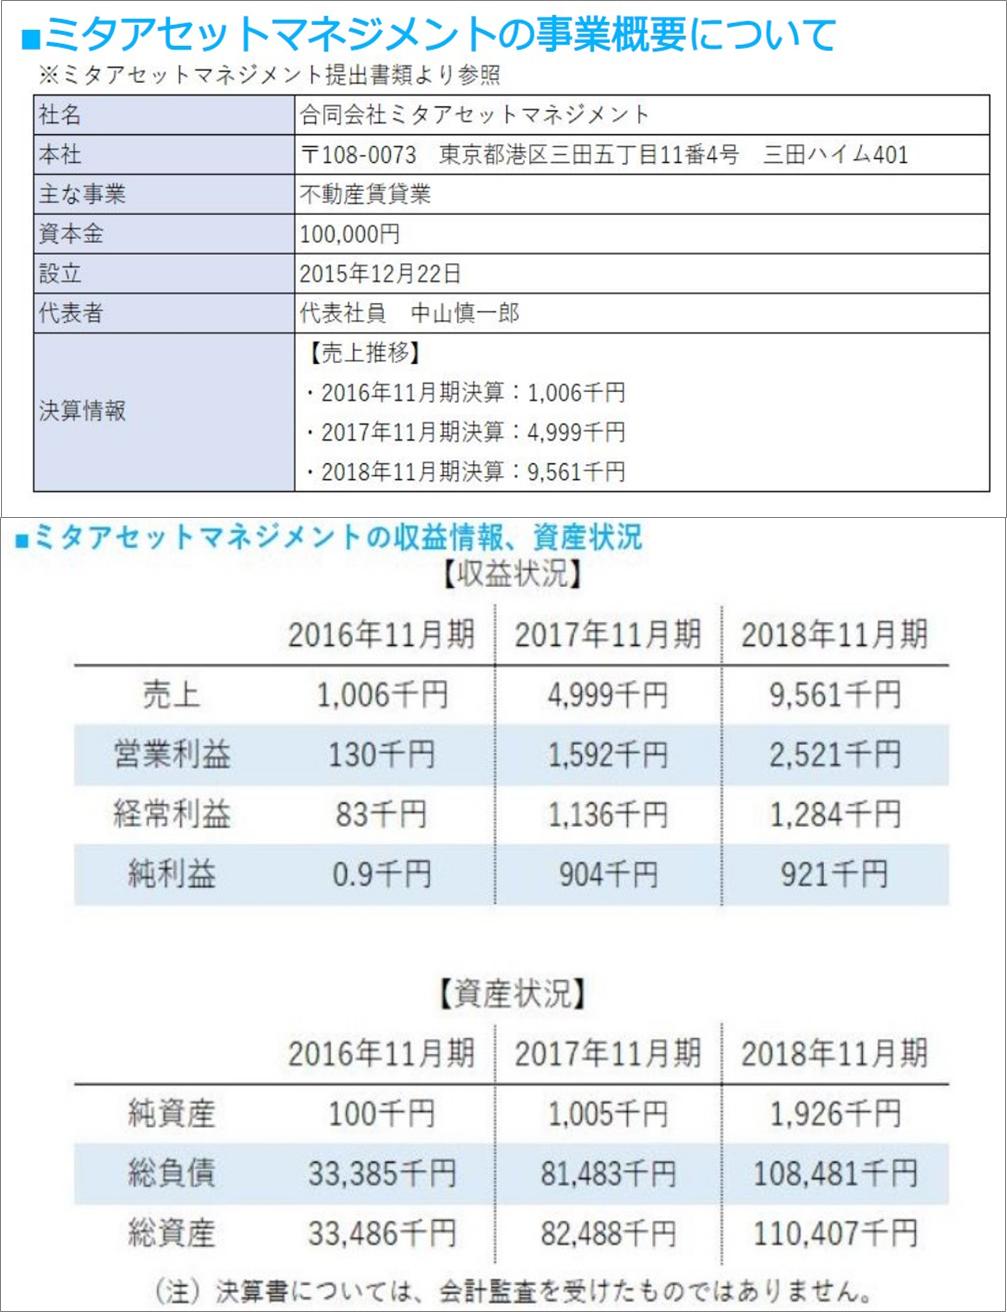 16_SAMURAI_不動産担保ローンミタアセットマネジメント